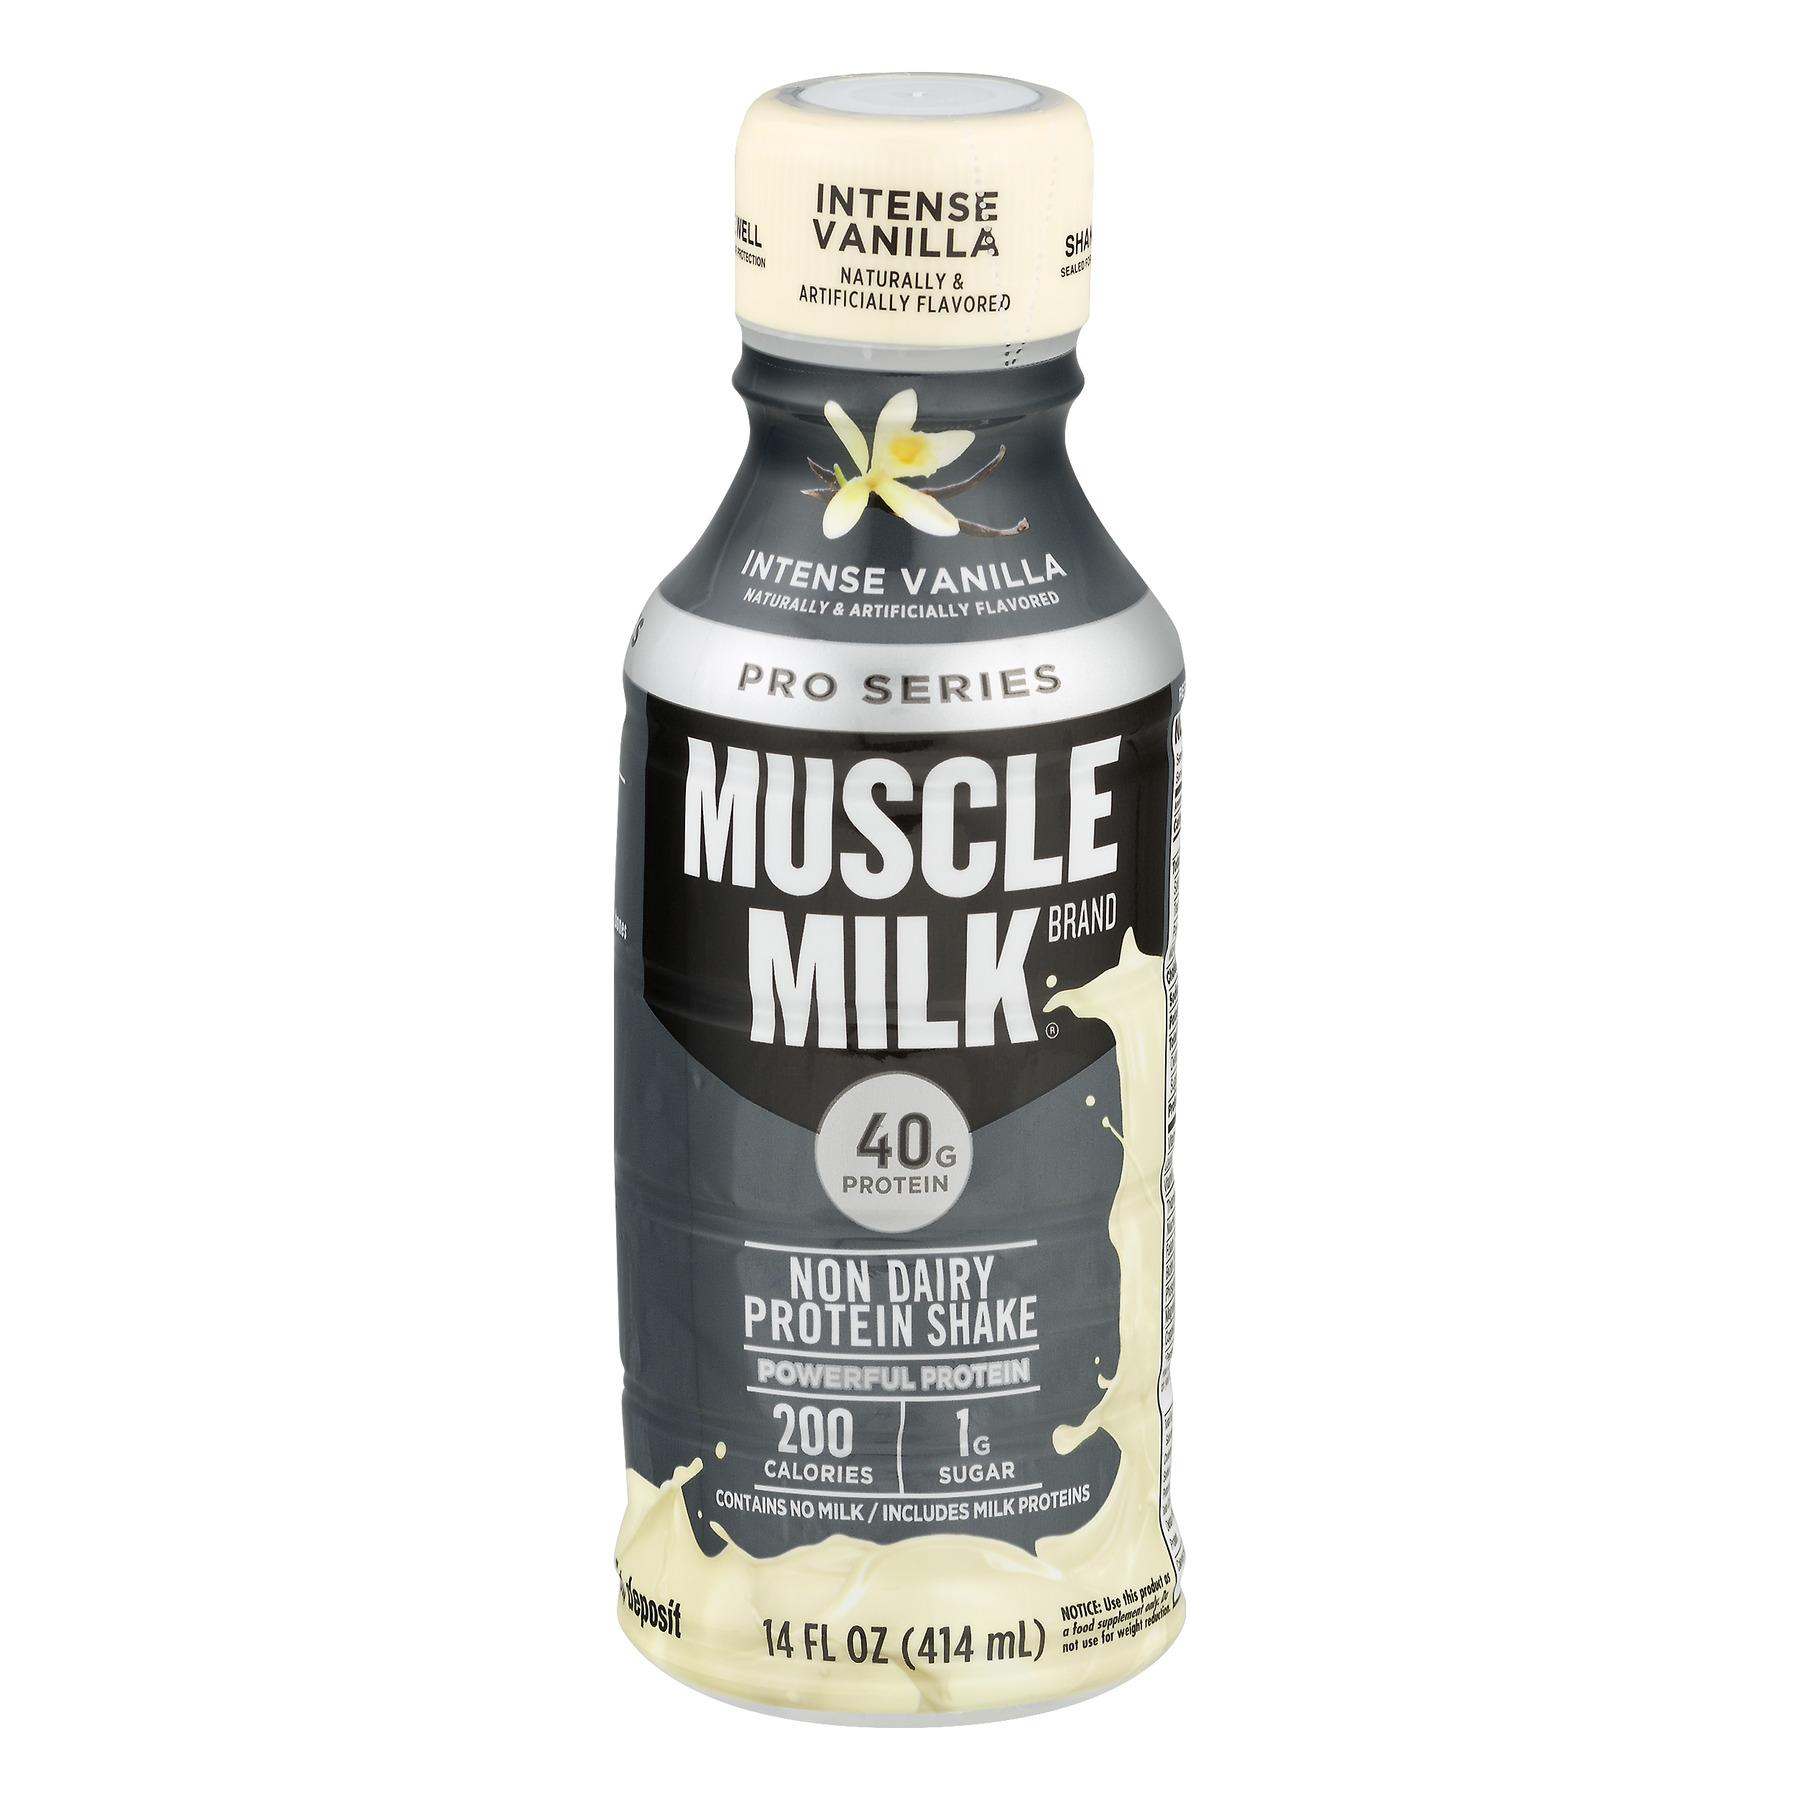 Muscle Milk Pro Series Protein Shake, Intense Vanilla, 40g Protein, 1 Ct